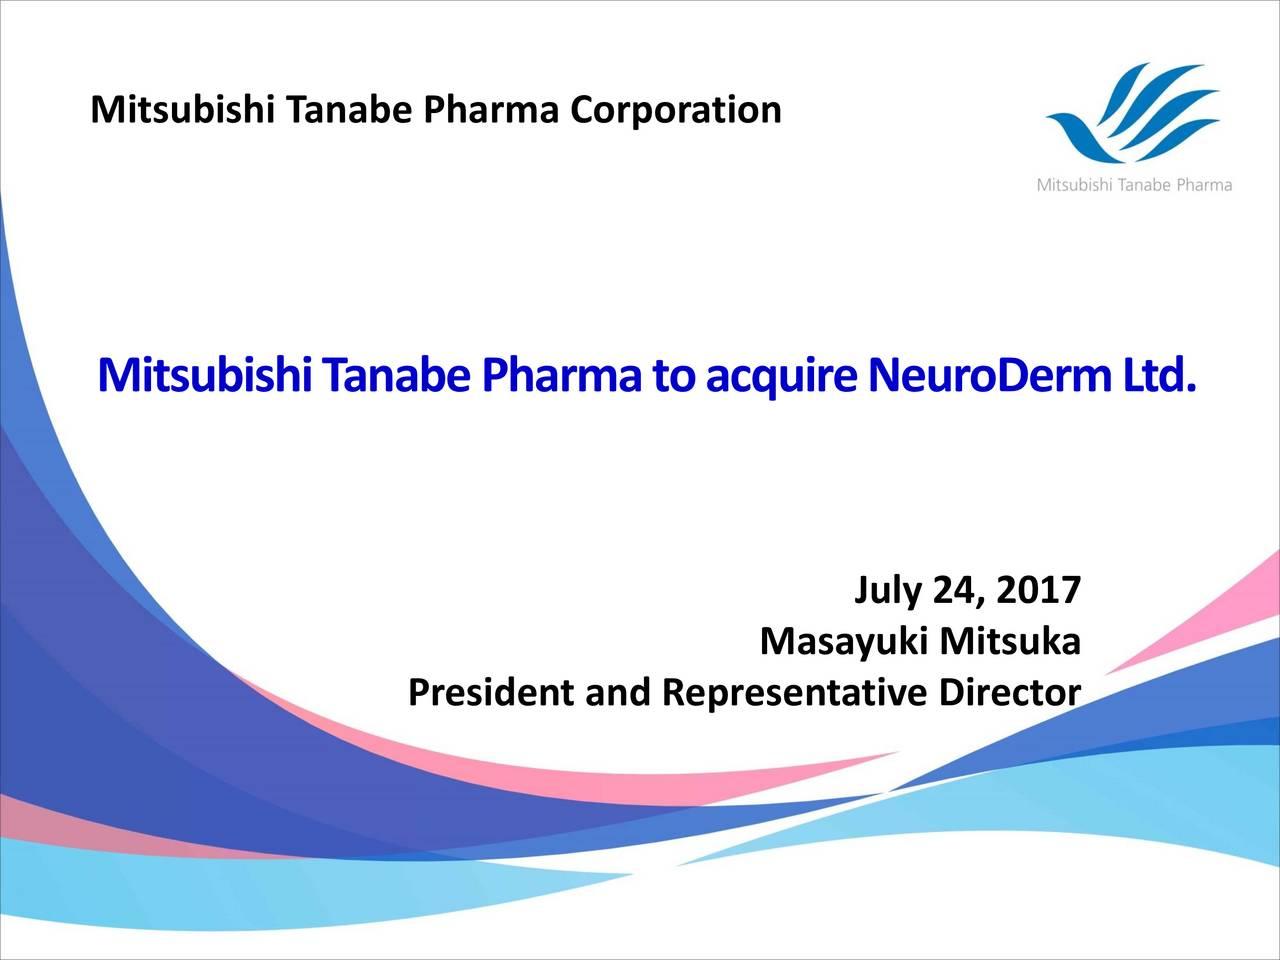 Mitsubishi Tanabe Pharma (MTZPY) Acquires NeuroDerm (NDRM) For $1 1B